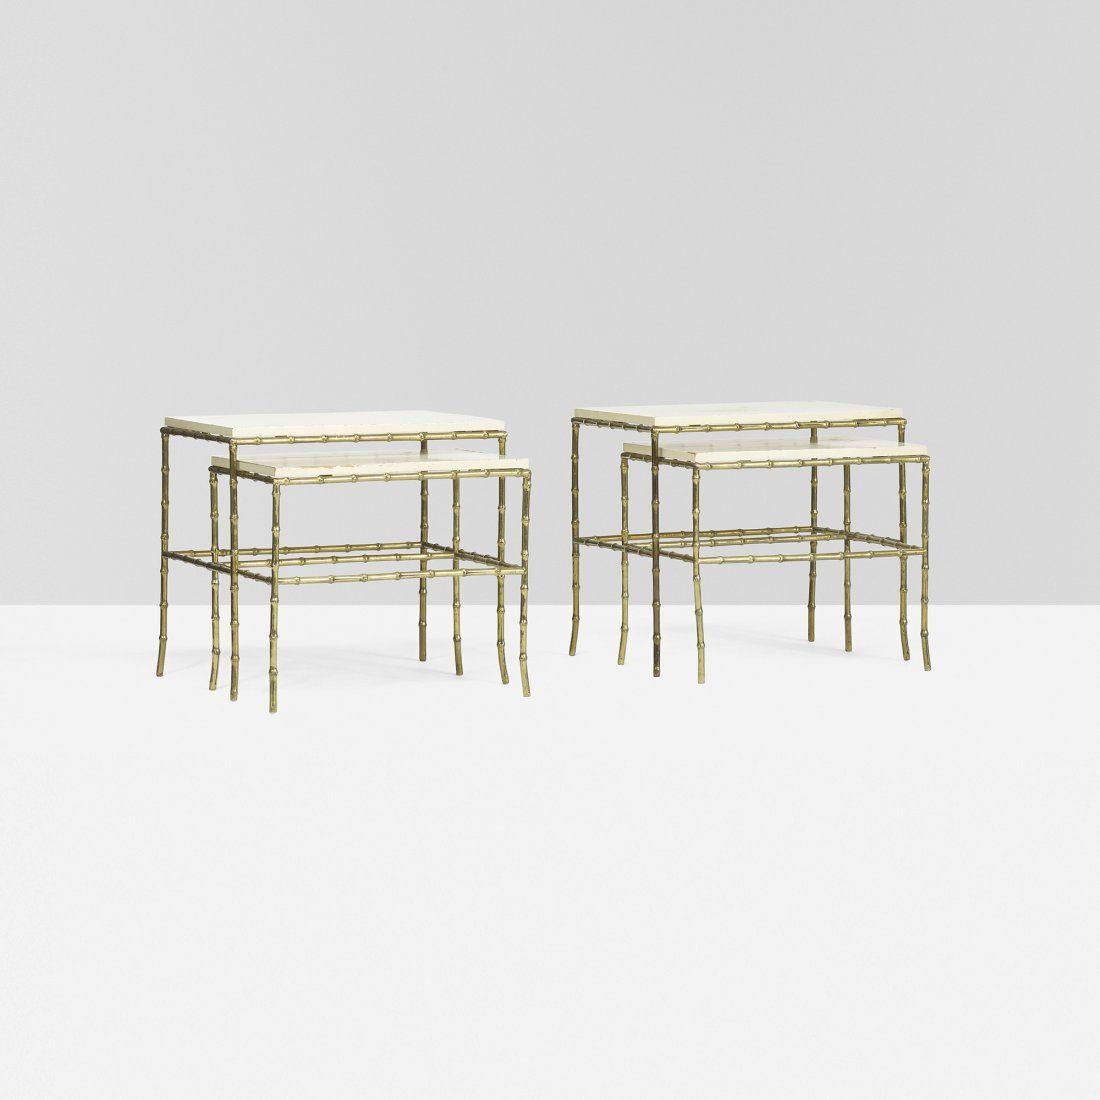 Tommi Parzinger pair of custom nesting tables